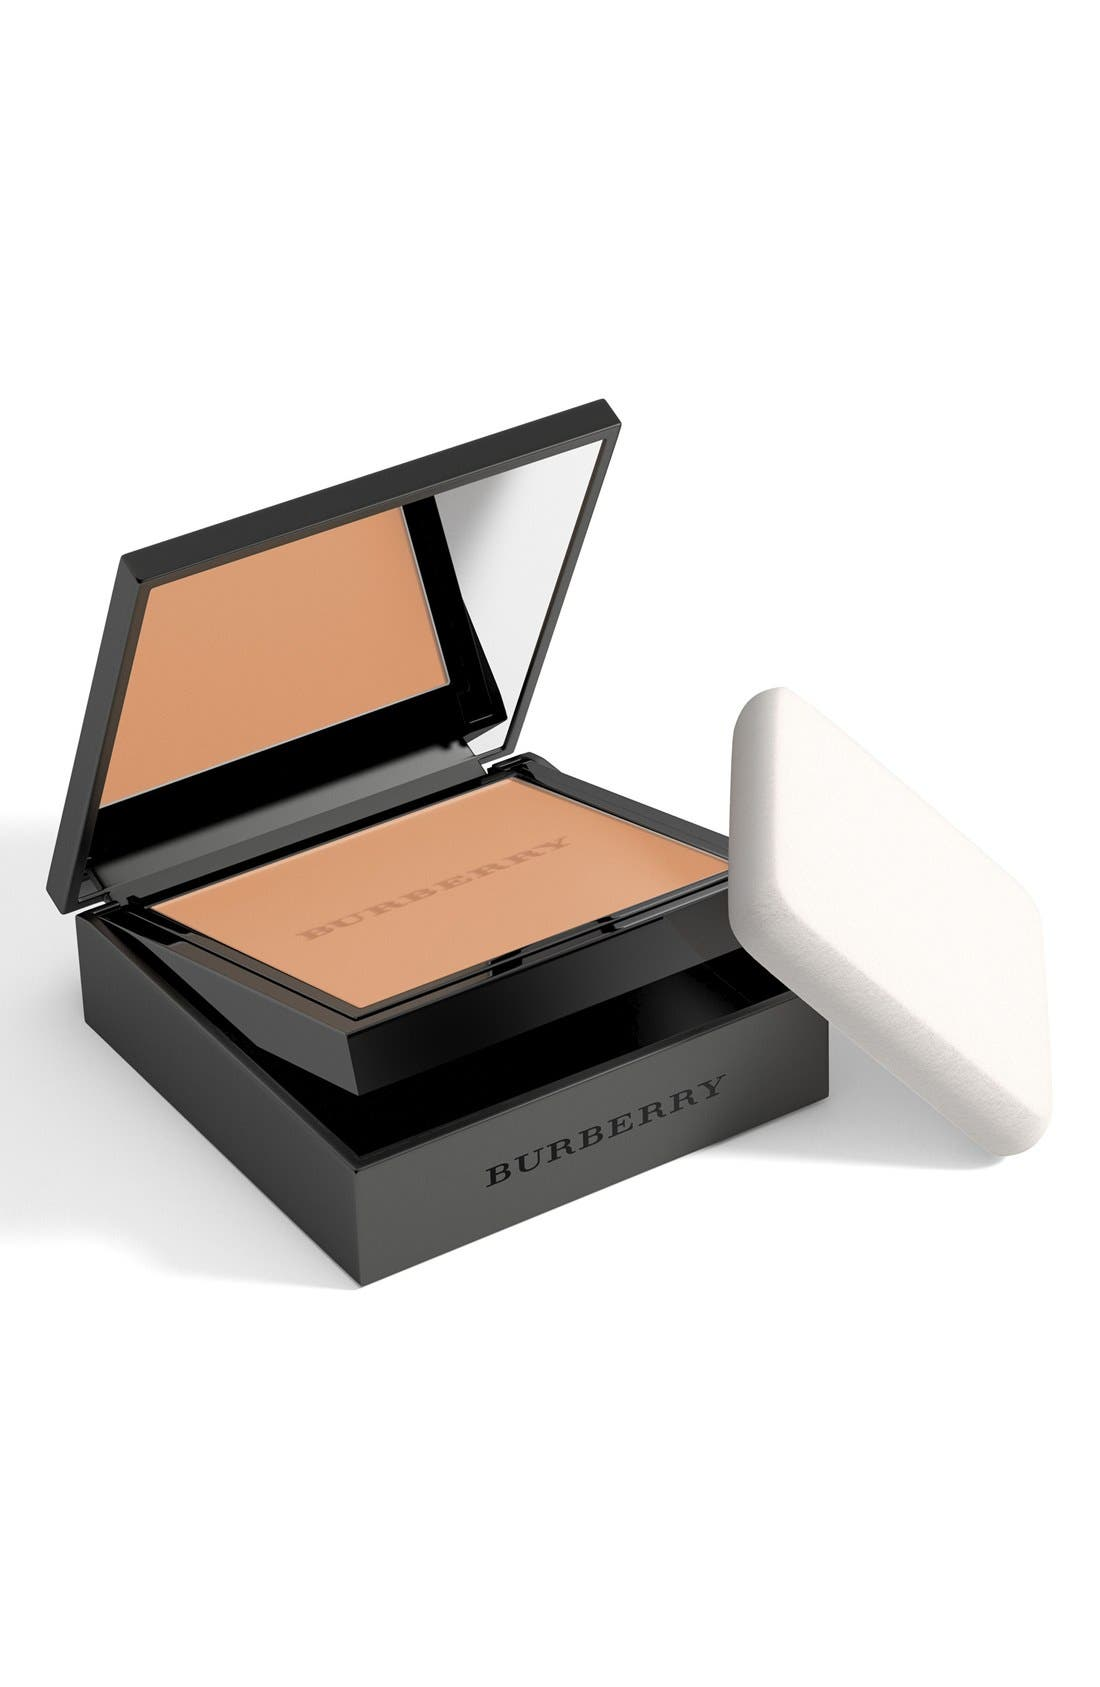 Burberry Beauty Cashmere Foundation Compact